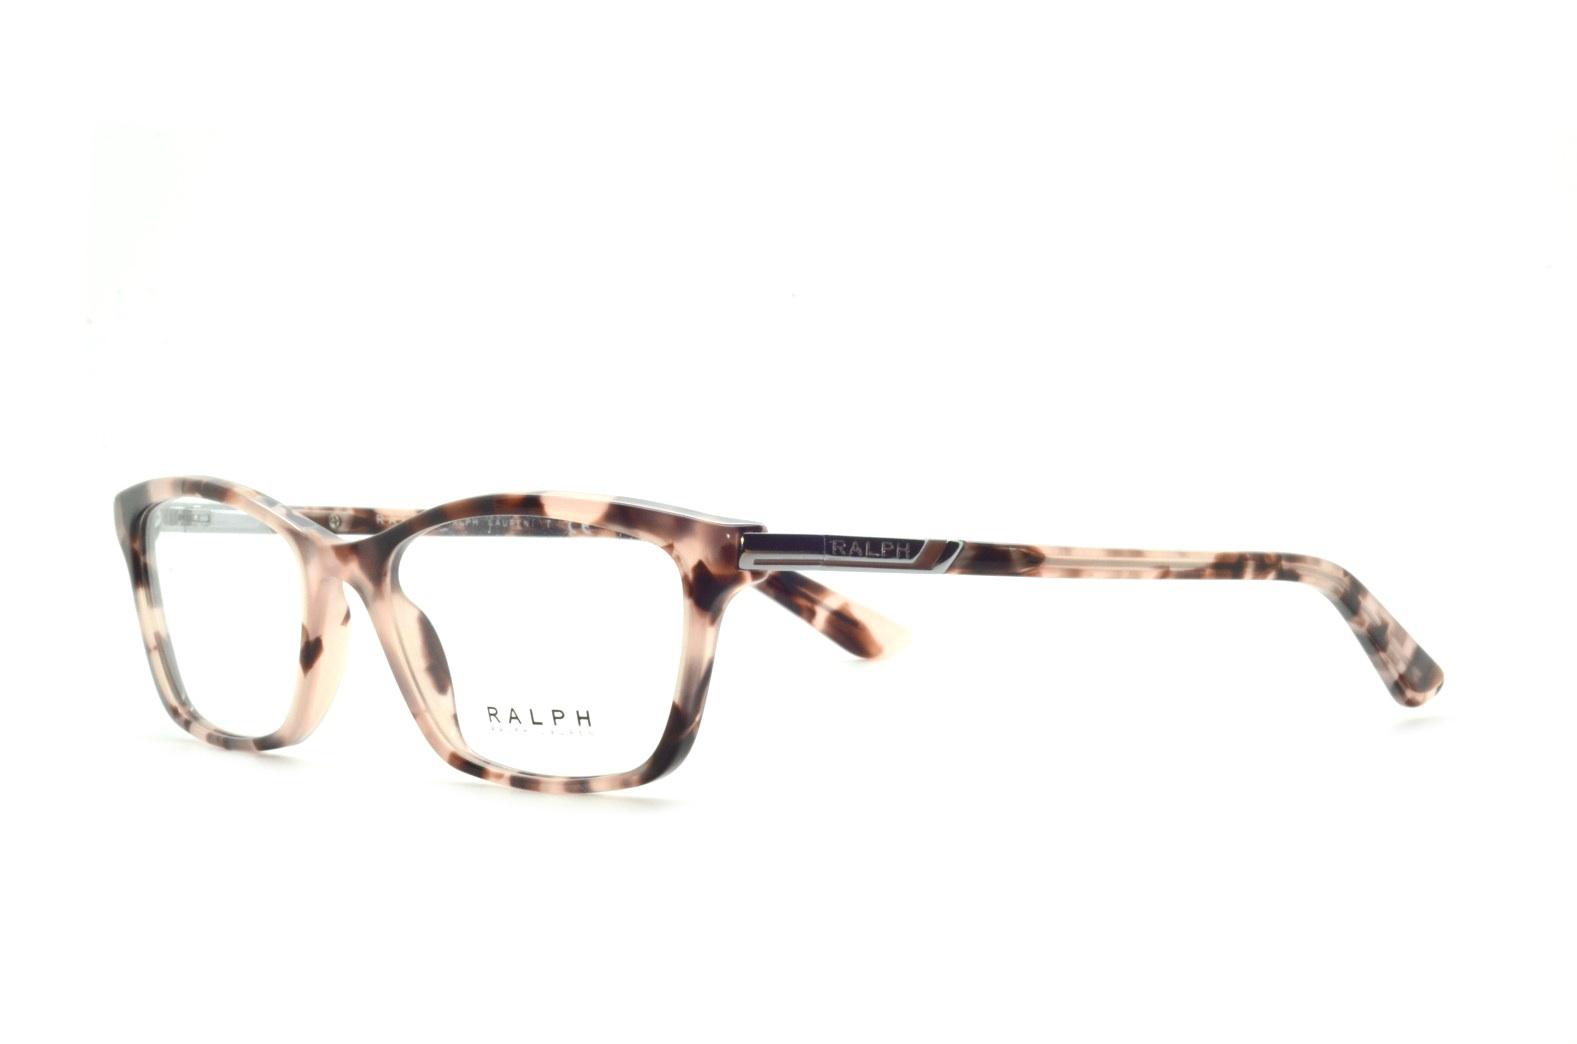 fccaba15ff5 New Authentic Ralph Lauren RA7044 1143 Eyeglasses Tortoise Yellow 52mm